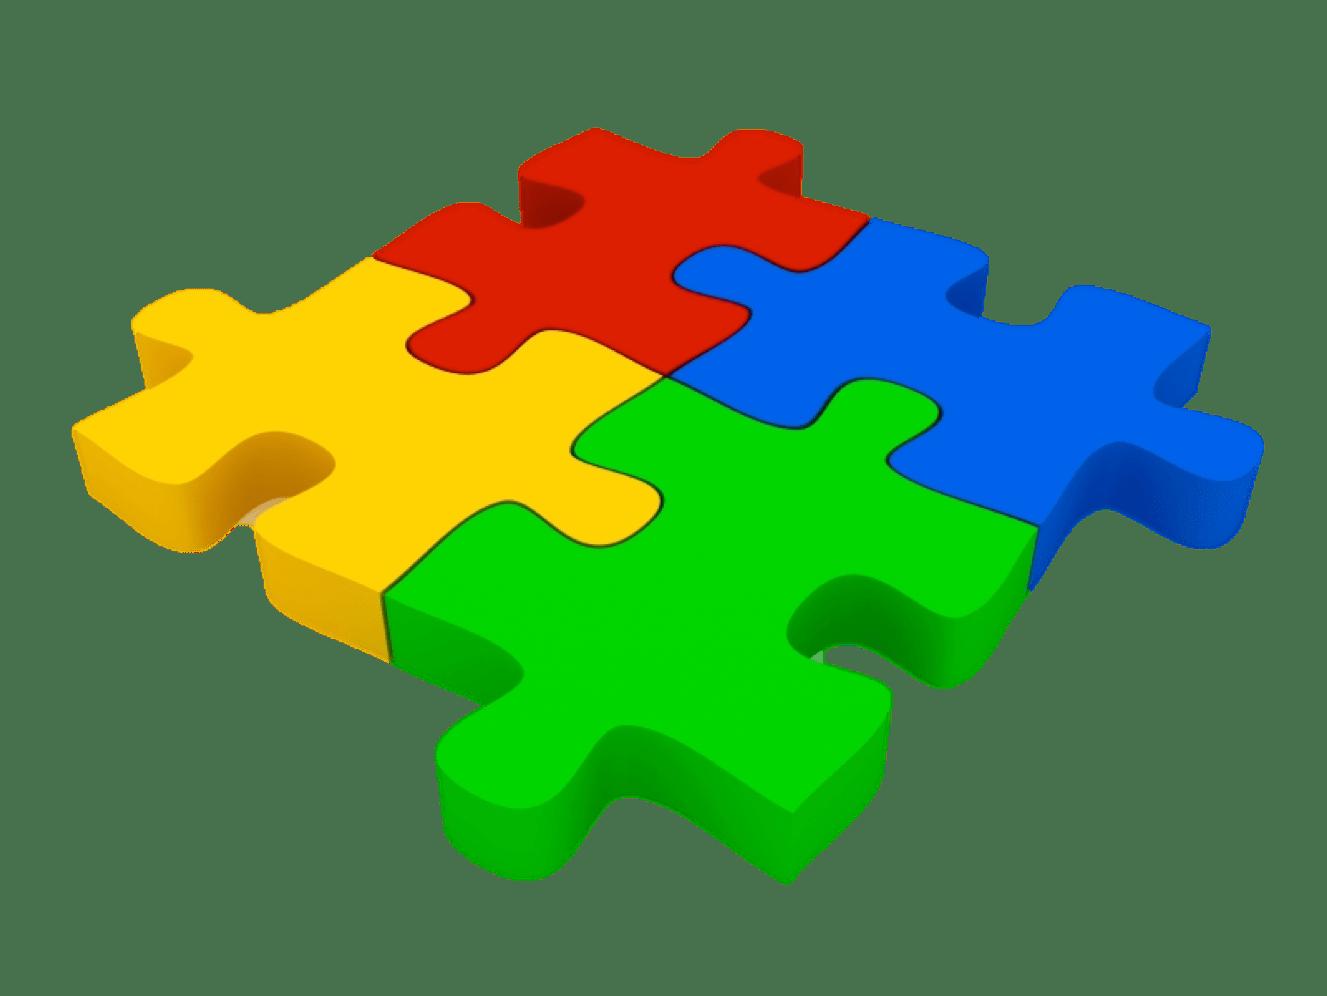 Improve Organizational Productivity By Eliminating Silo D Work